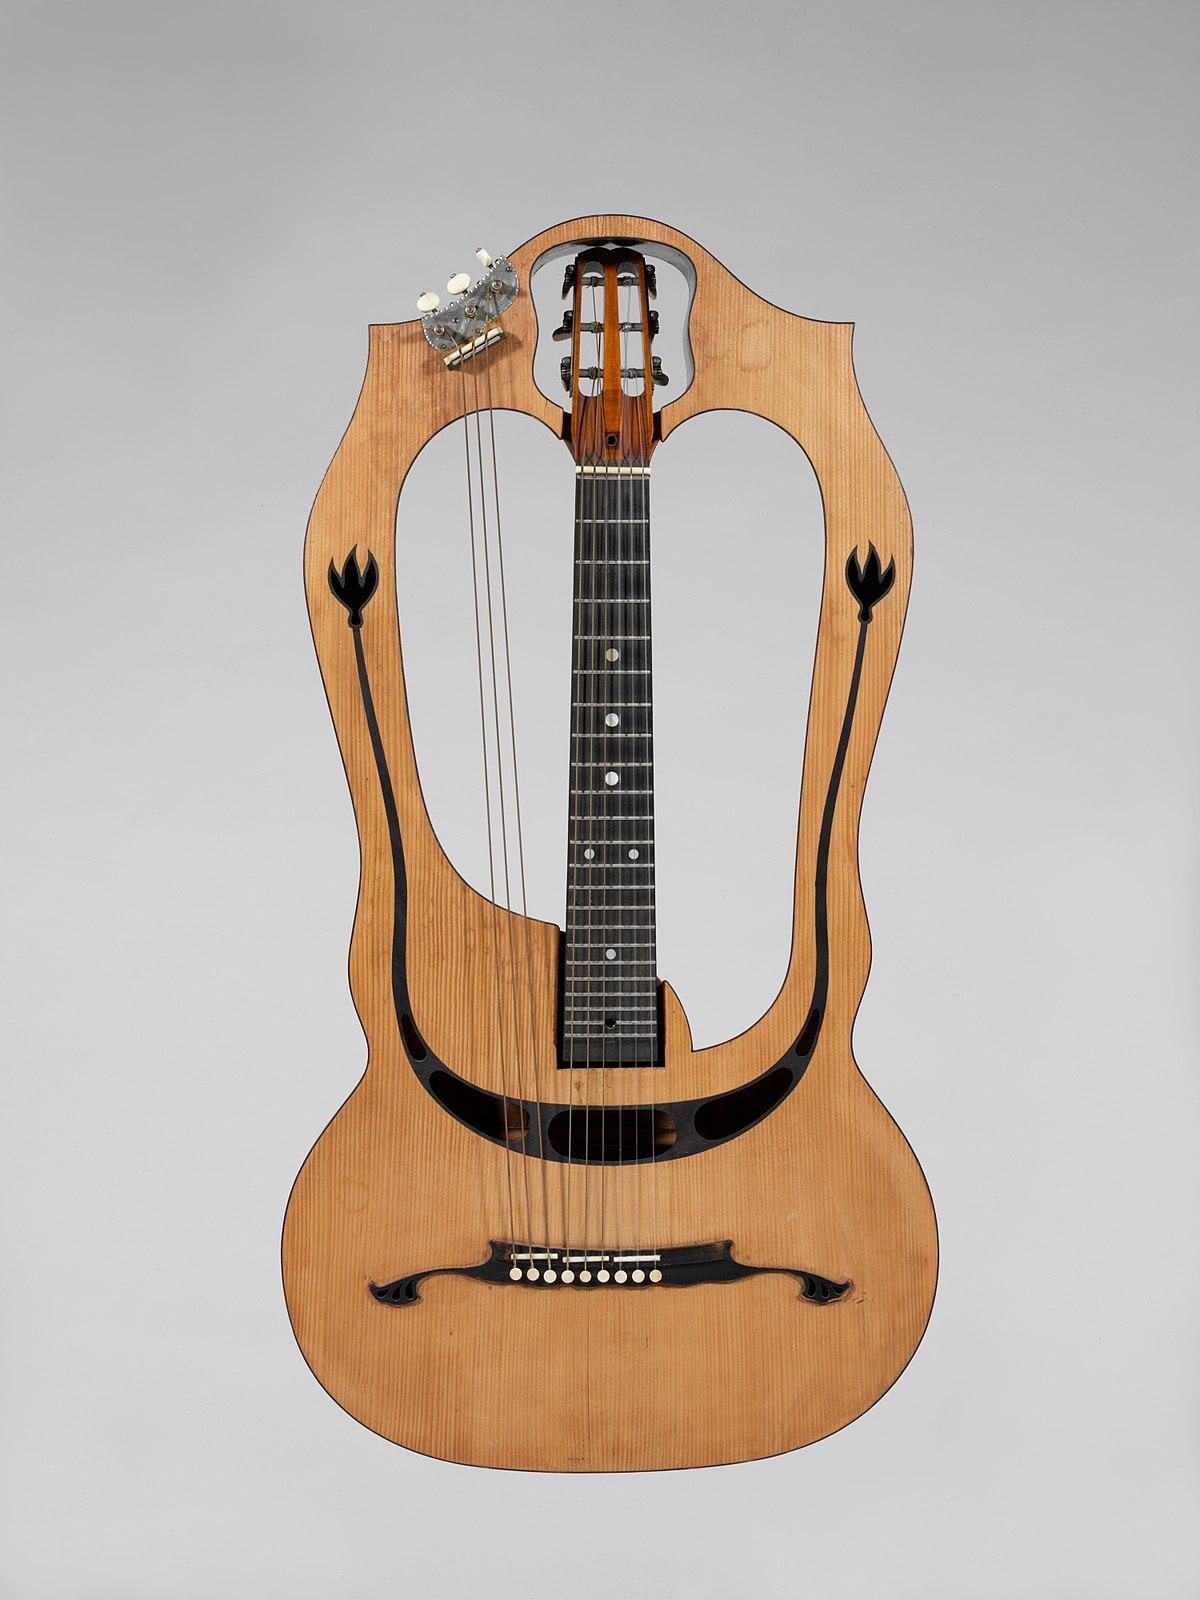 guitare harpe wikip dia. Black Bedroom Furniture Sets. Home Design Ideas